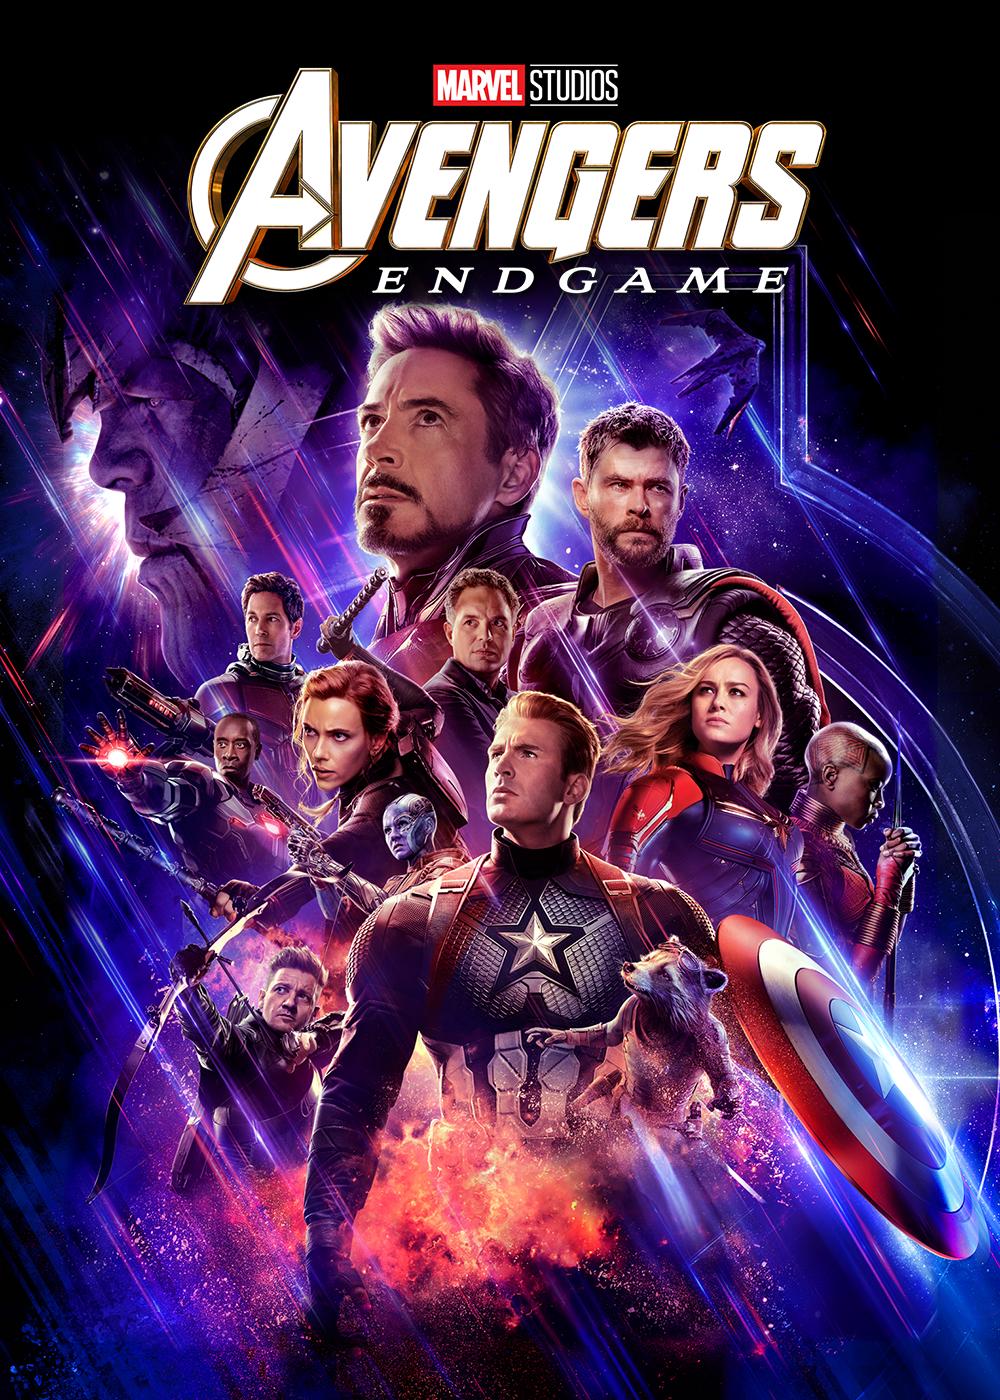 Avengers endgame P DE